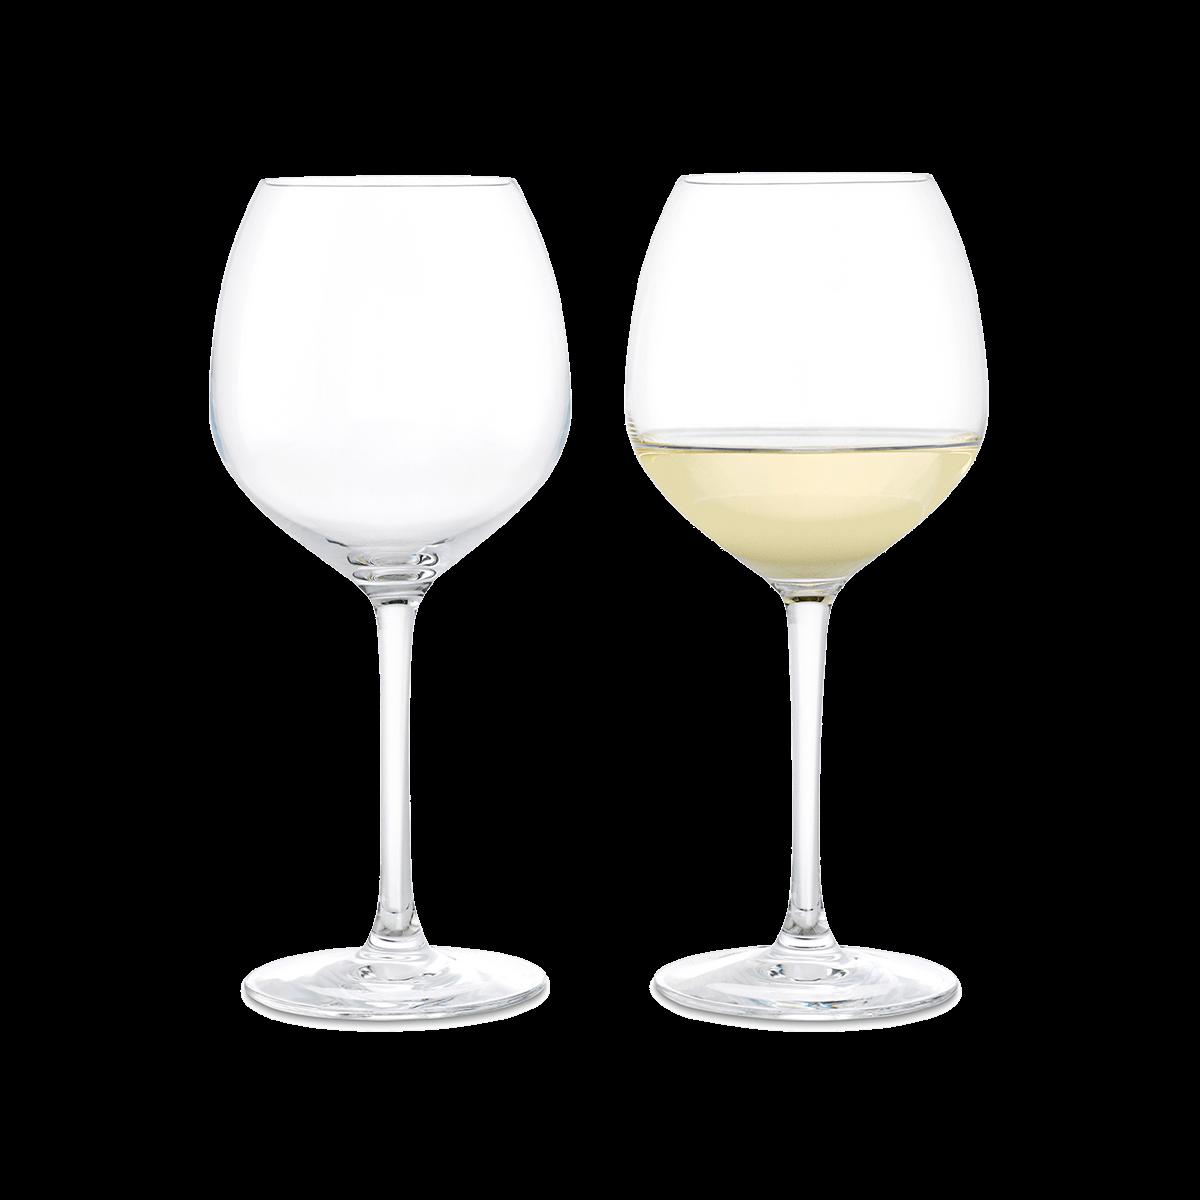 Rosendahl - Premium White Wine Glass - 2 pack (29601)